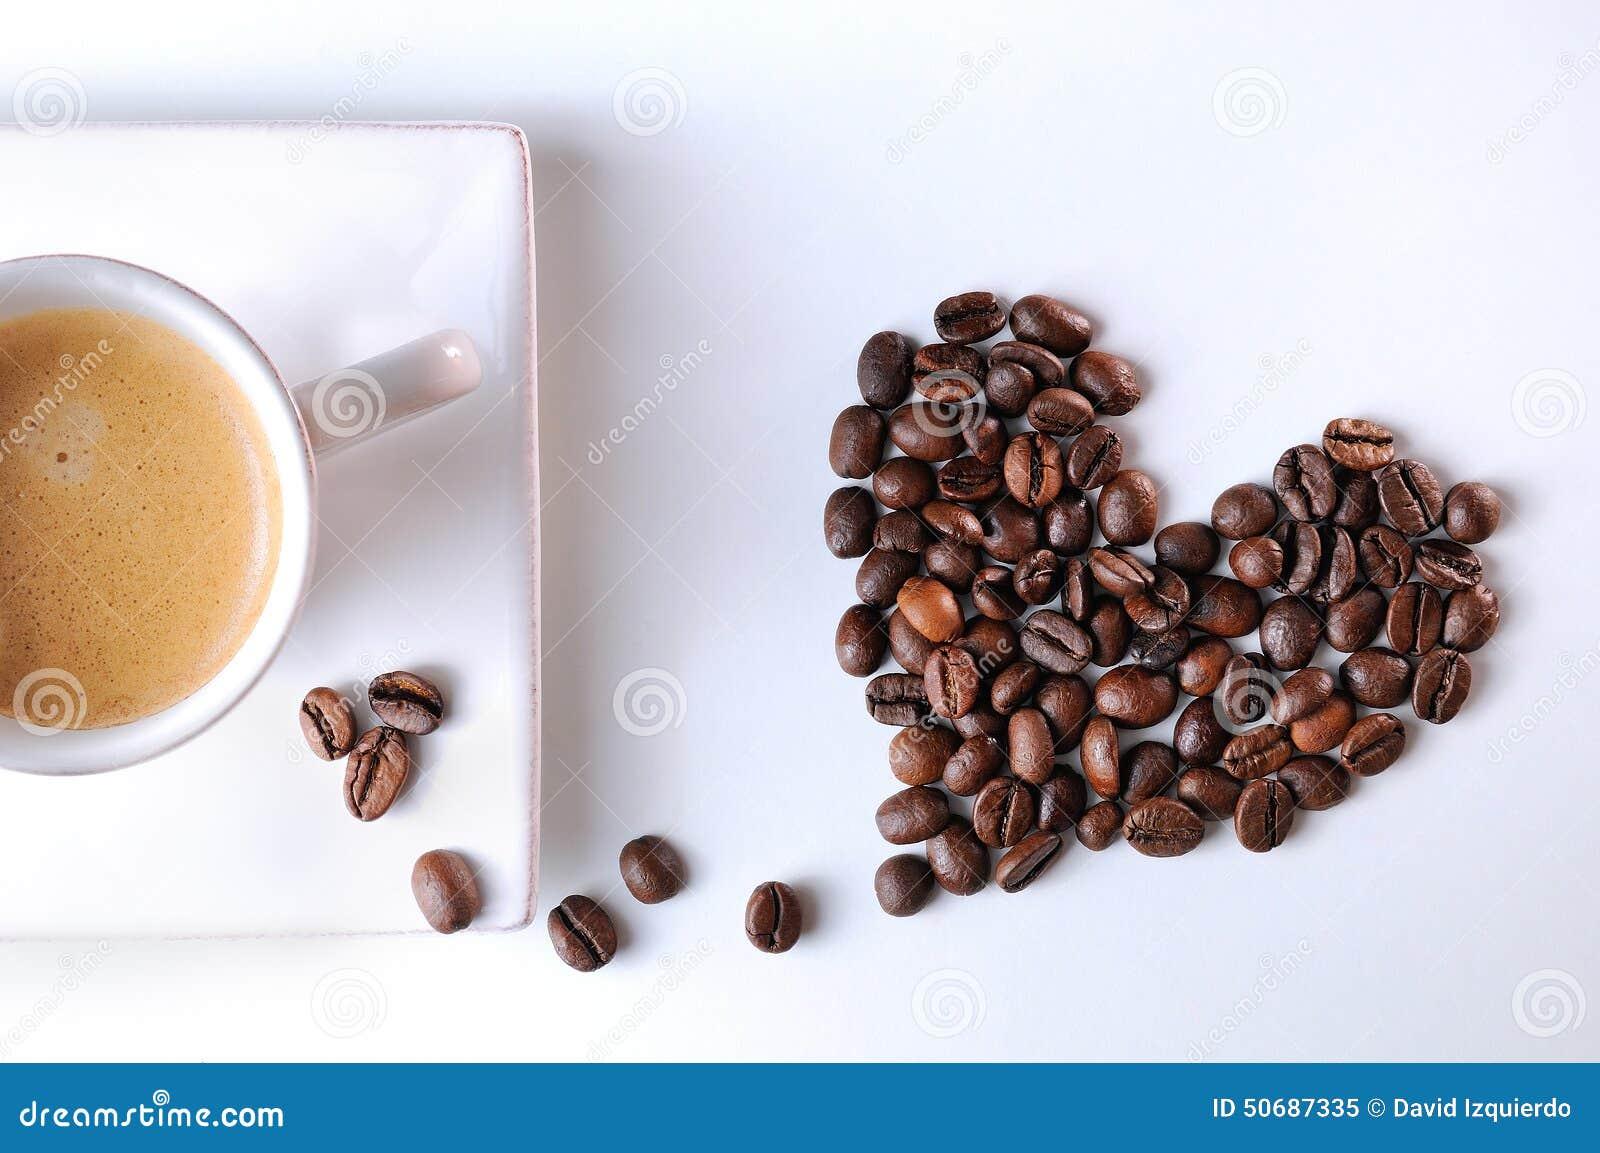 Download 与五谷和咖啡杯的心脏 库存图片. 图片 包括有 杯子, 谷物, 液体, 制动手, 阿诺德, 鲜美, 浓咖啡 - 50687335